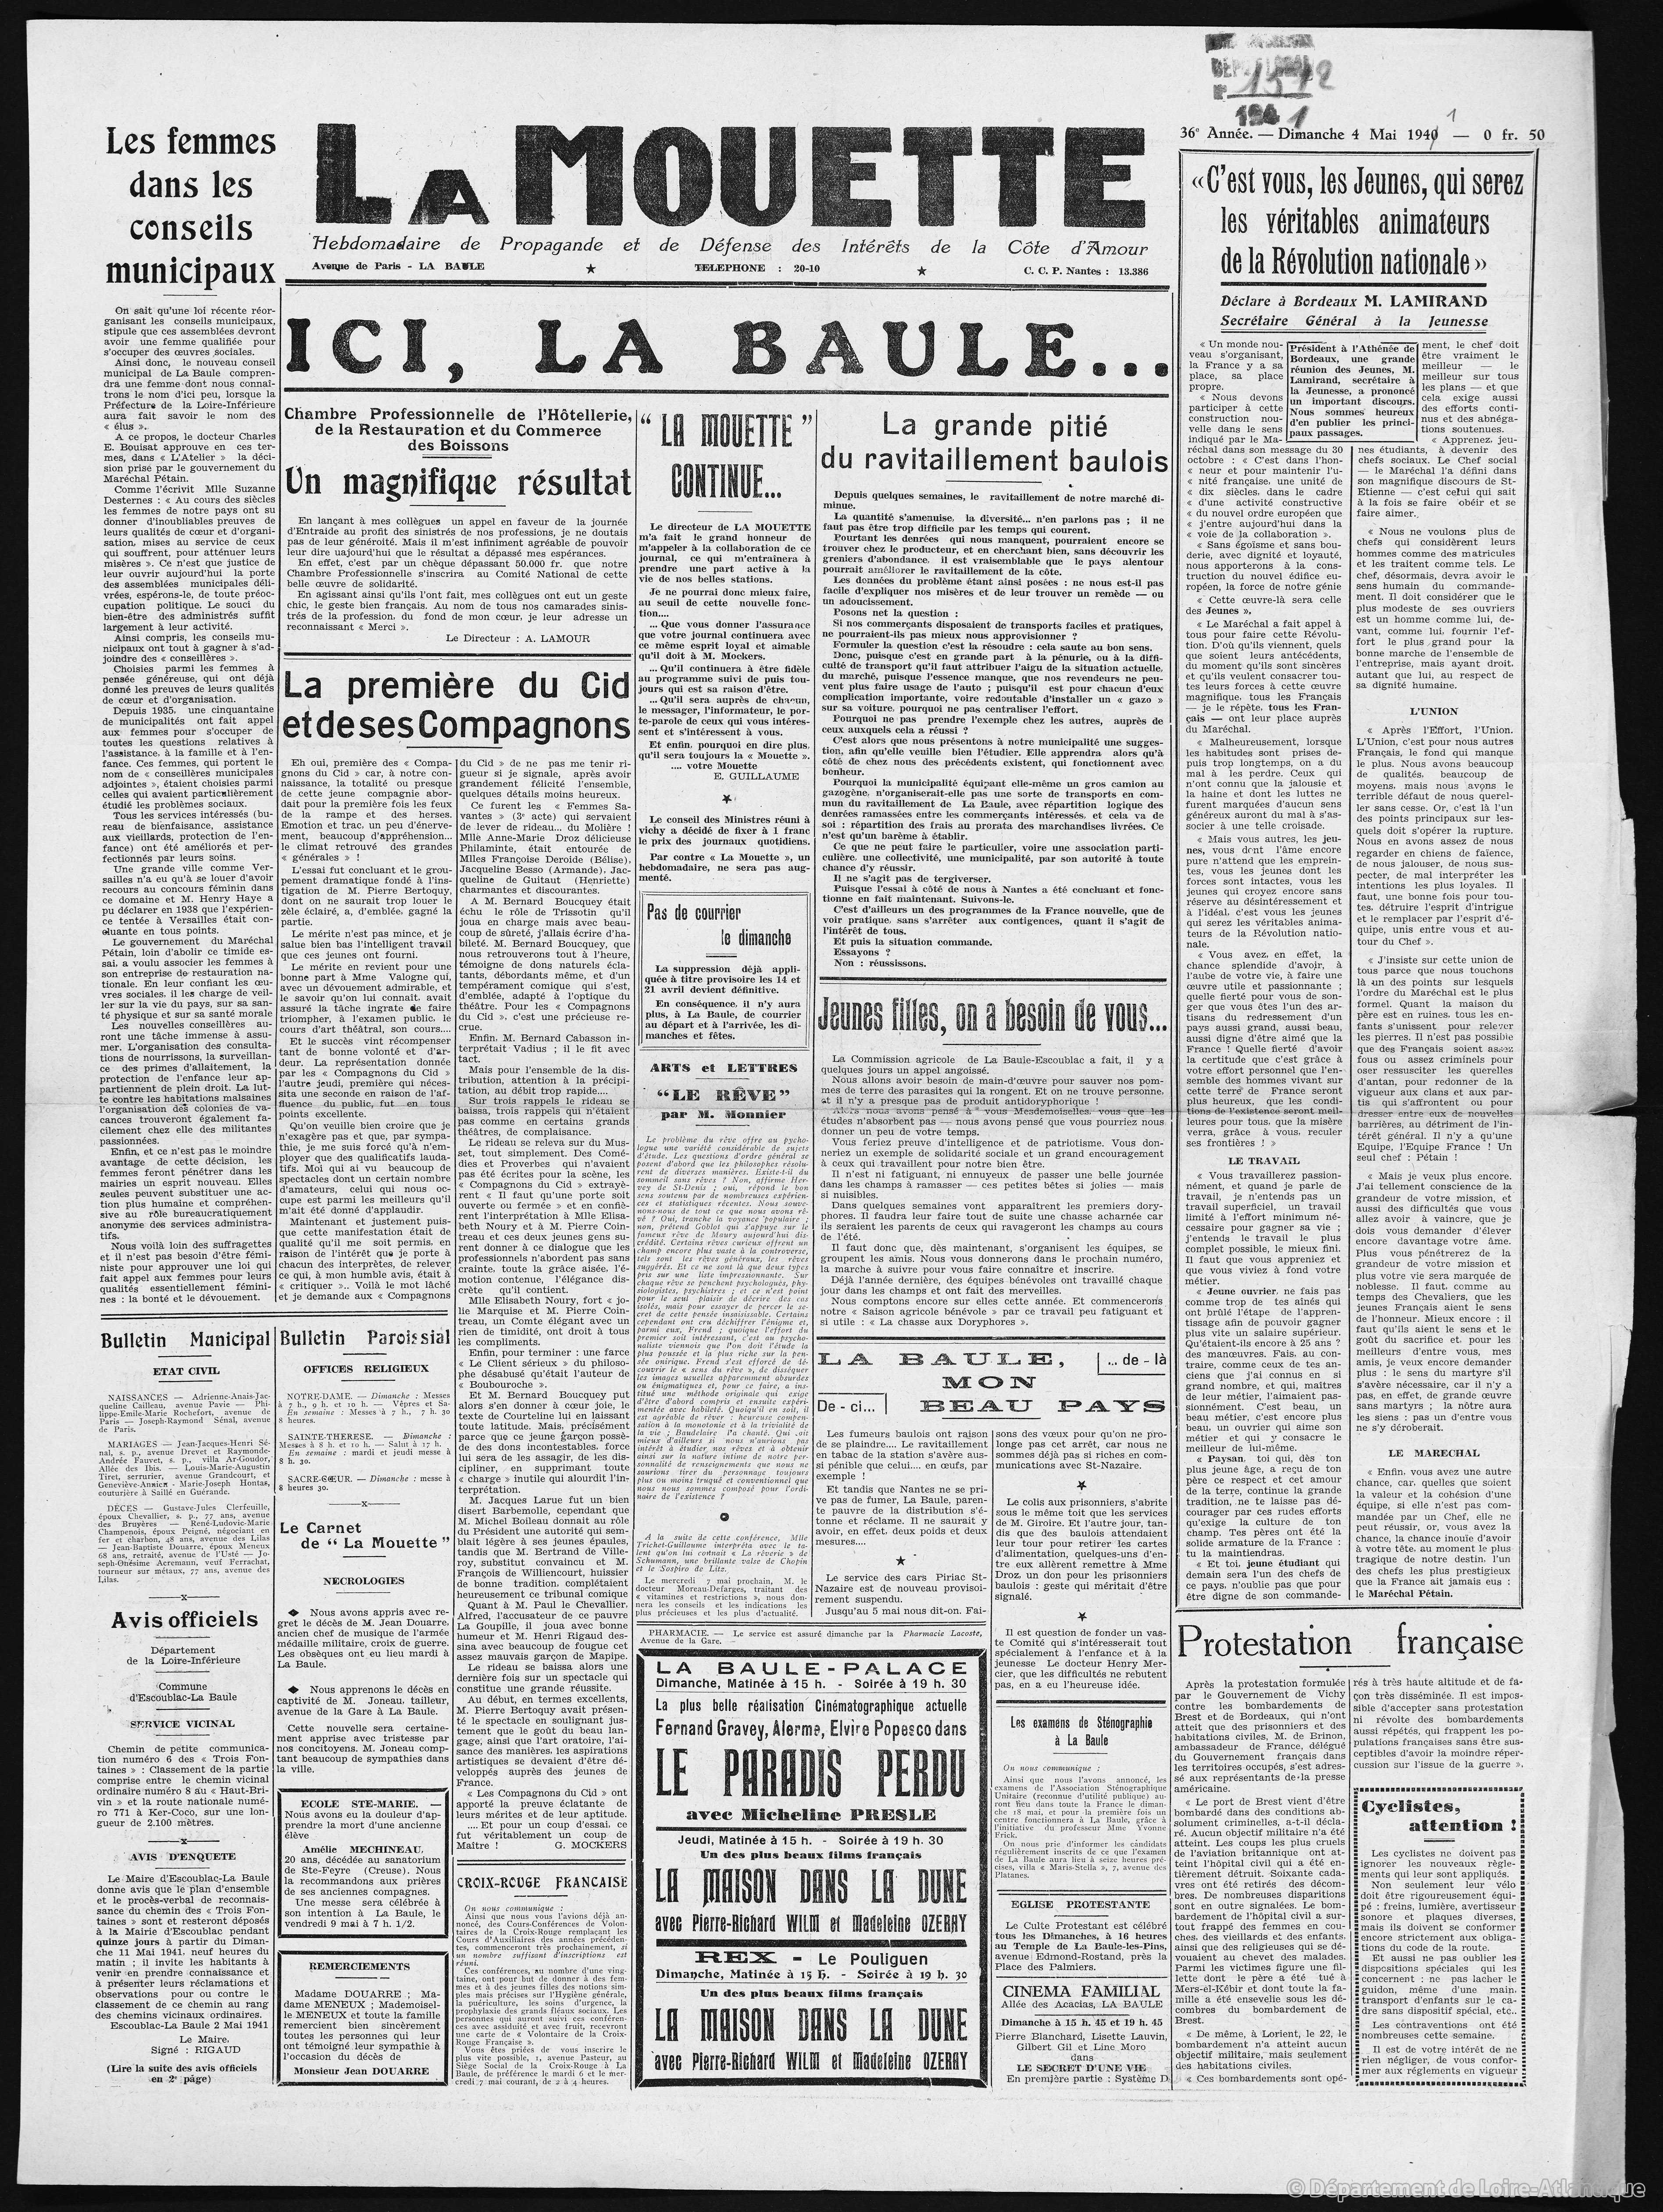 La Mouette 04 mai 1941 [ADLA, presse en ligne]